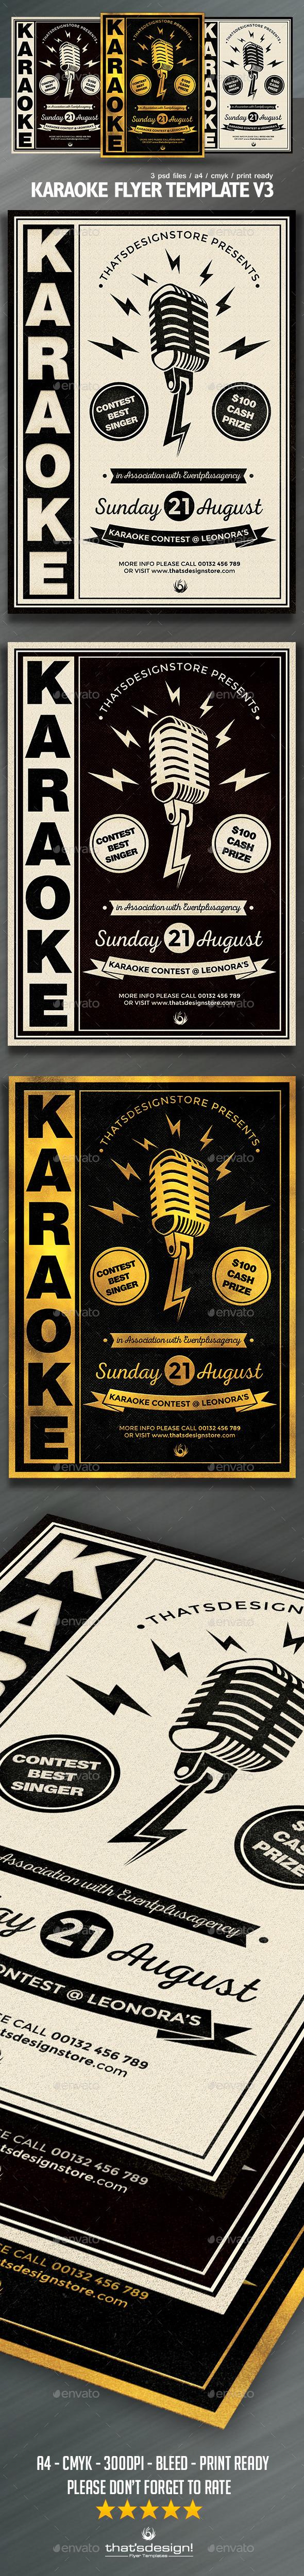 Karaoke Flyer Template Psd Design Download Httpgraphicriver